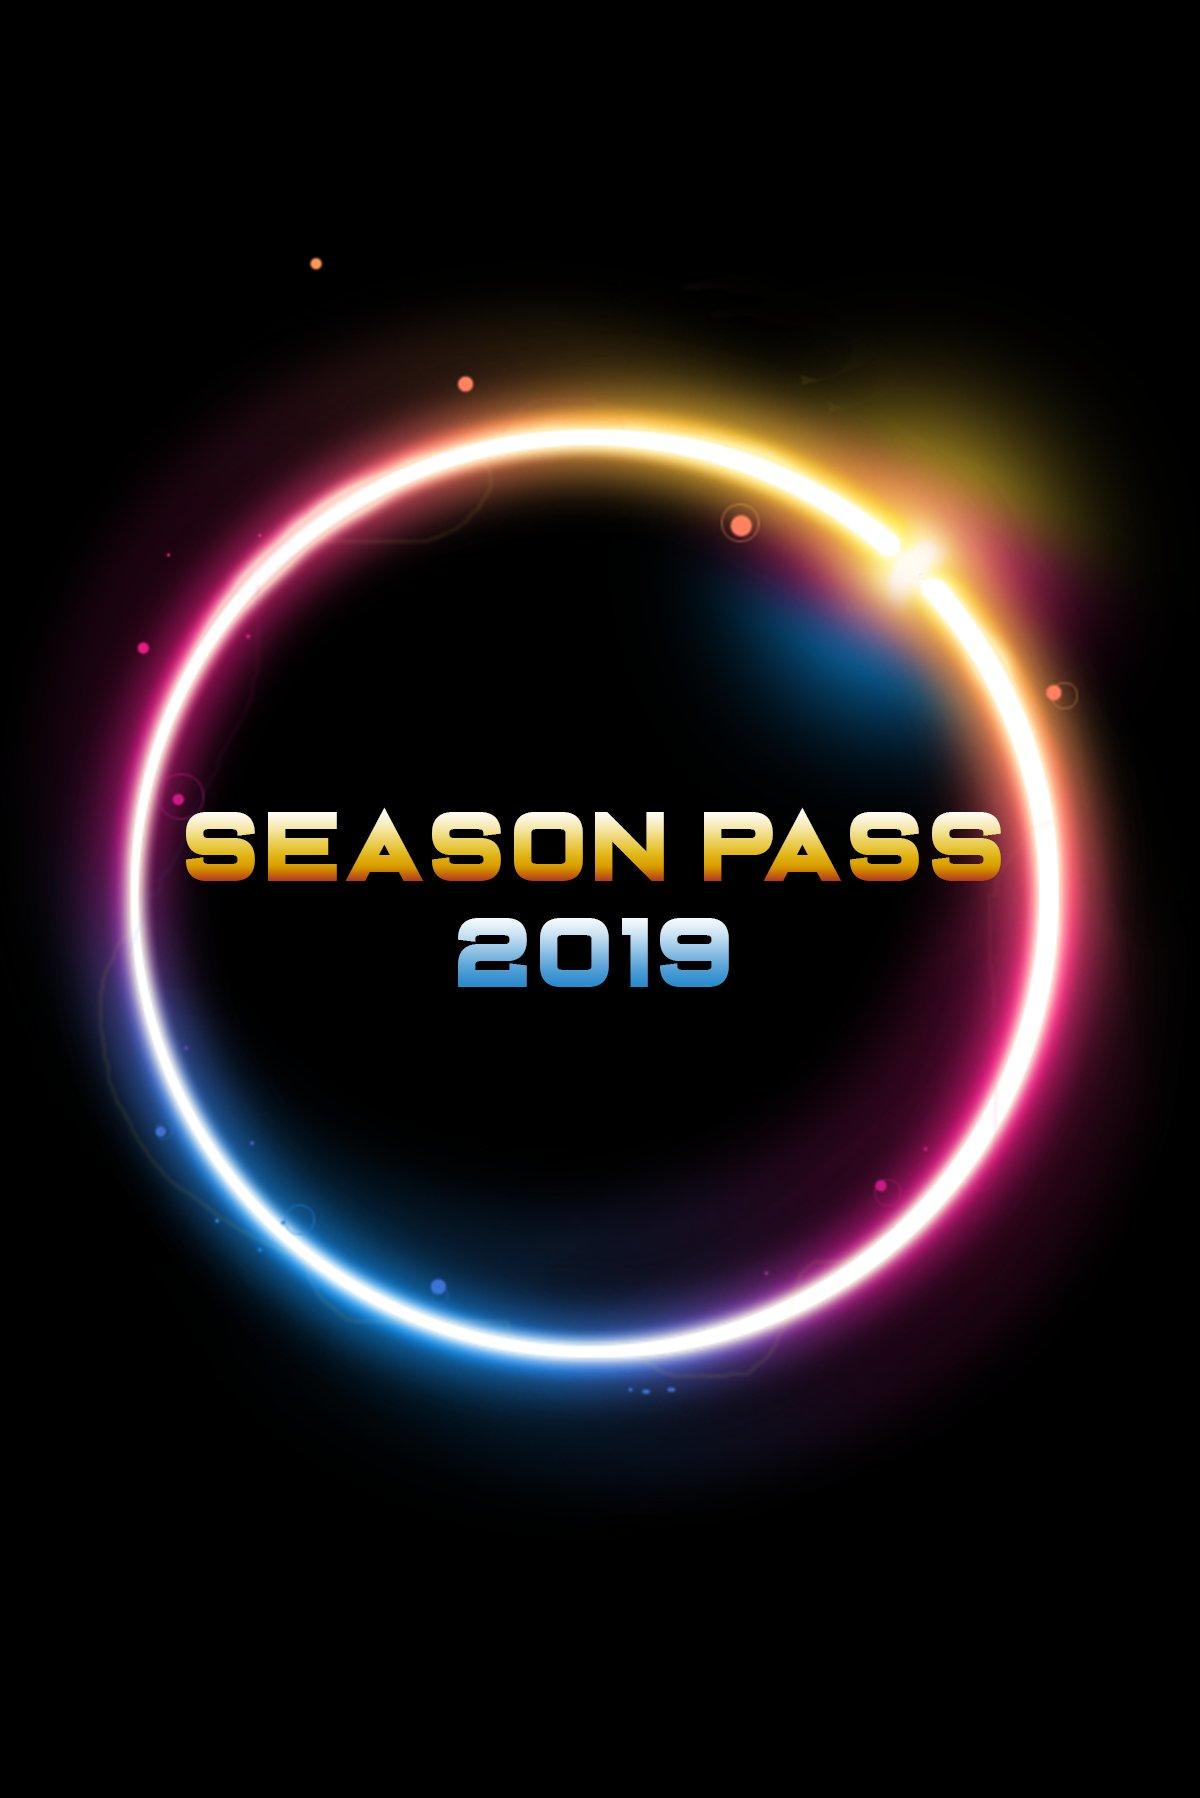 Image of 2019 Season Pass